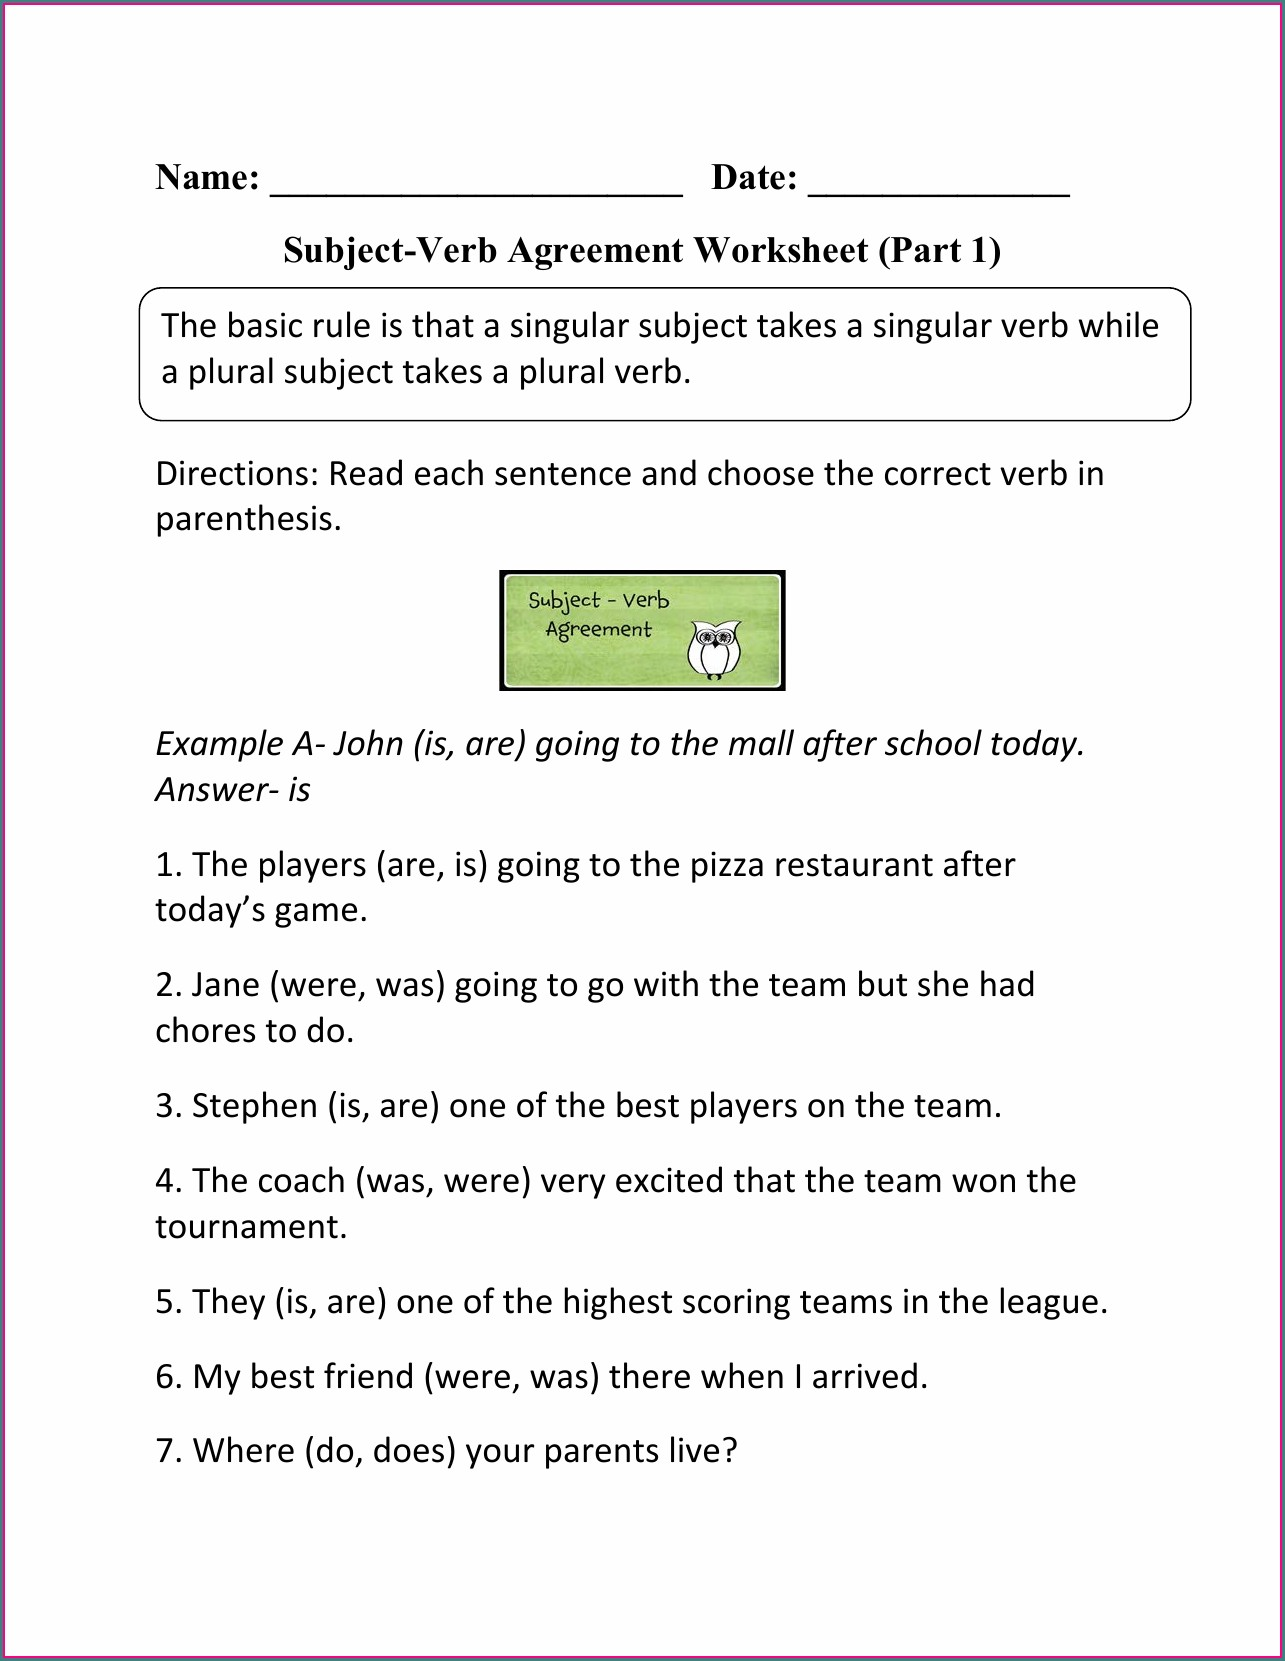 Subject Verb Agreement Worksheet For Grade 2